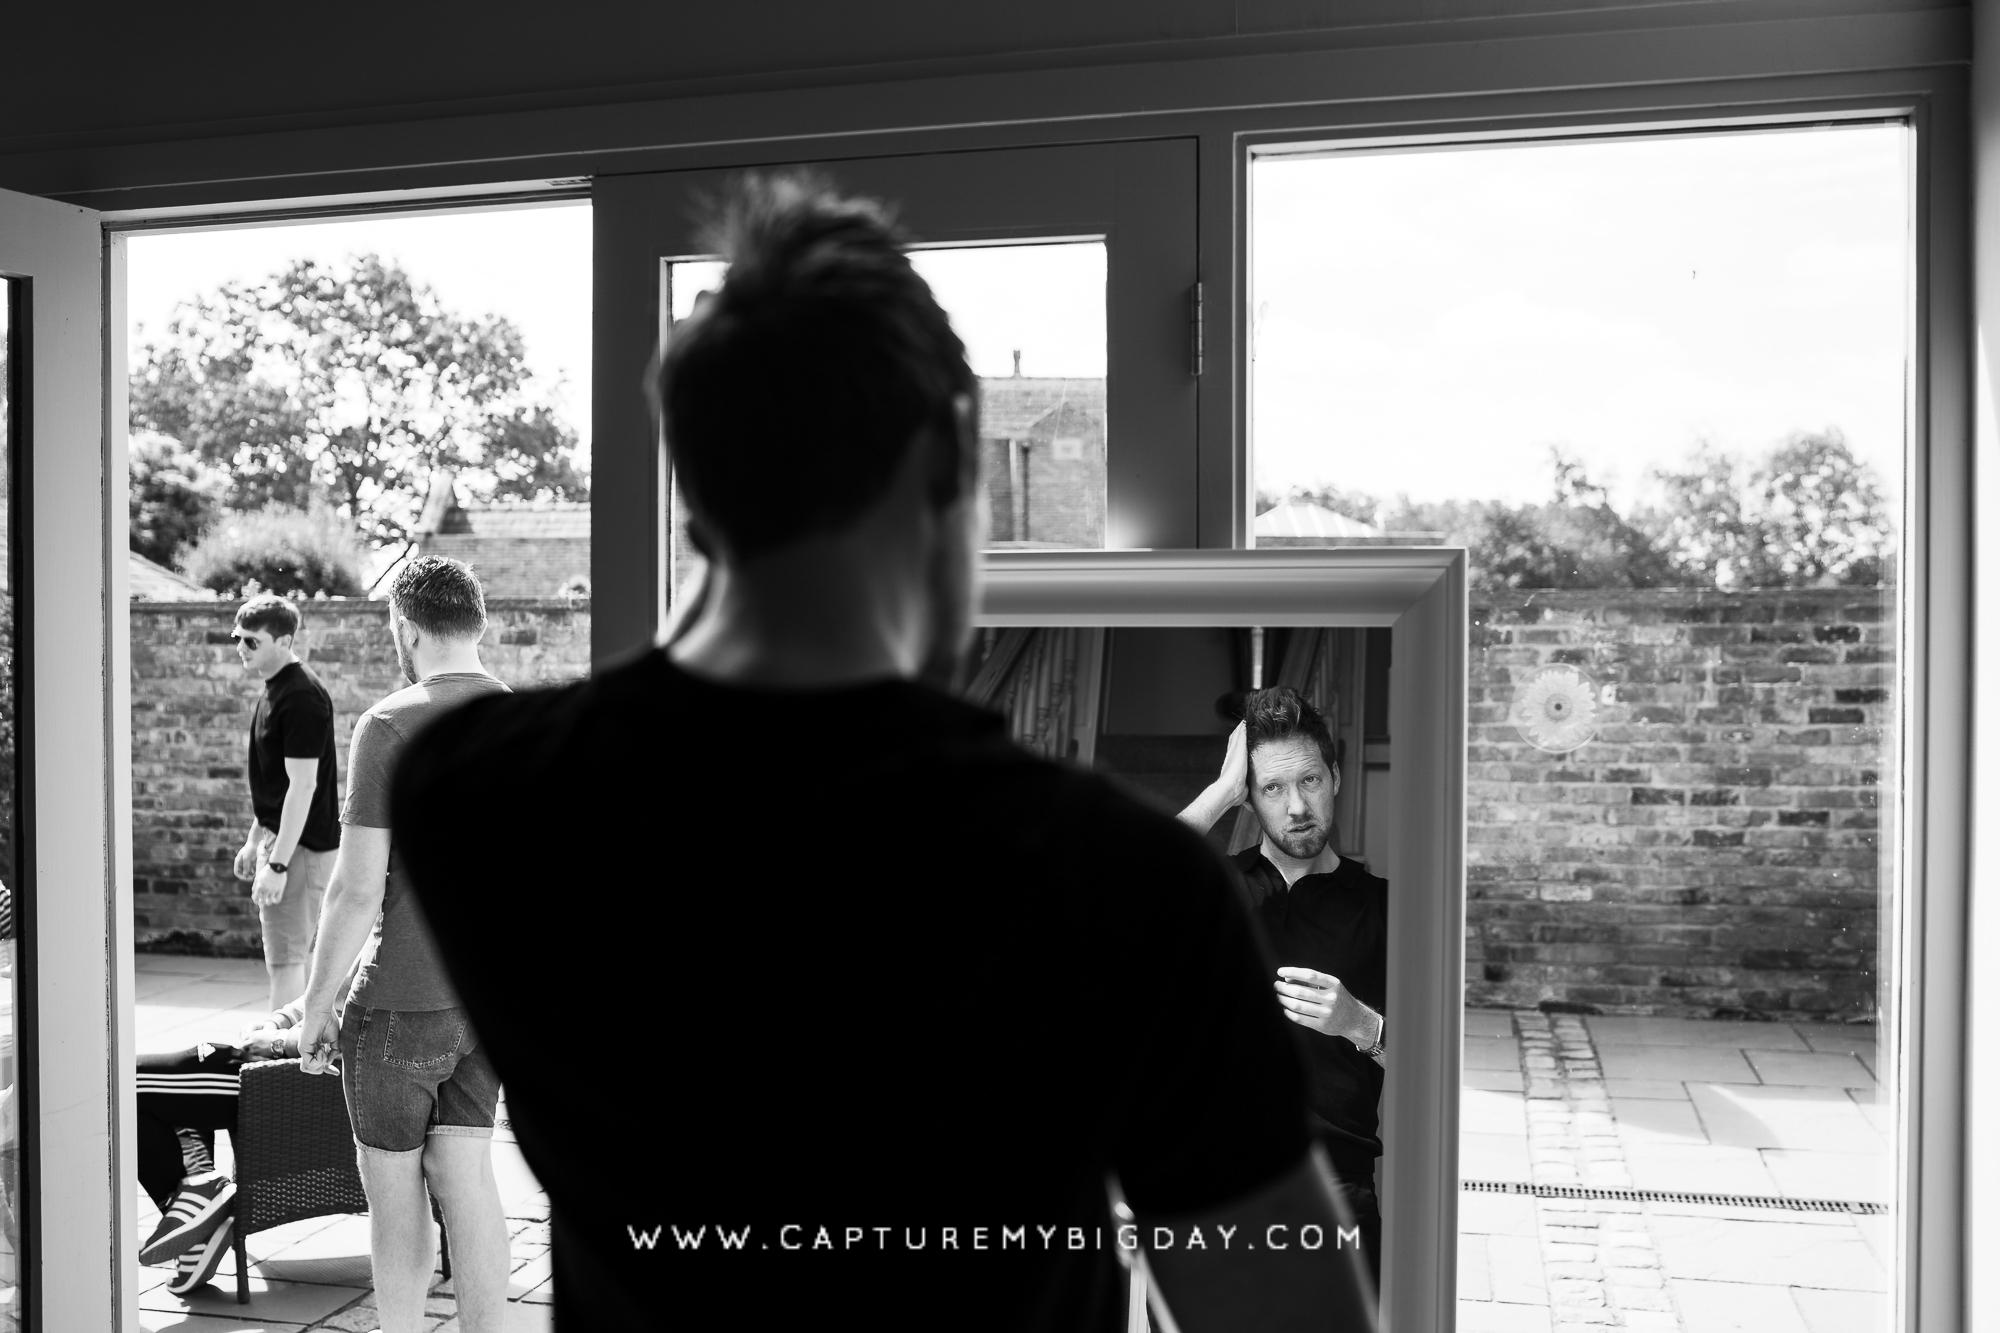 groom styling his hair in mirror